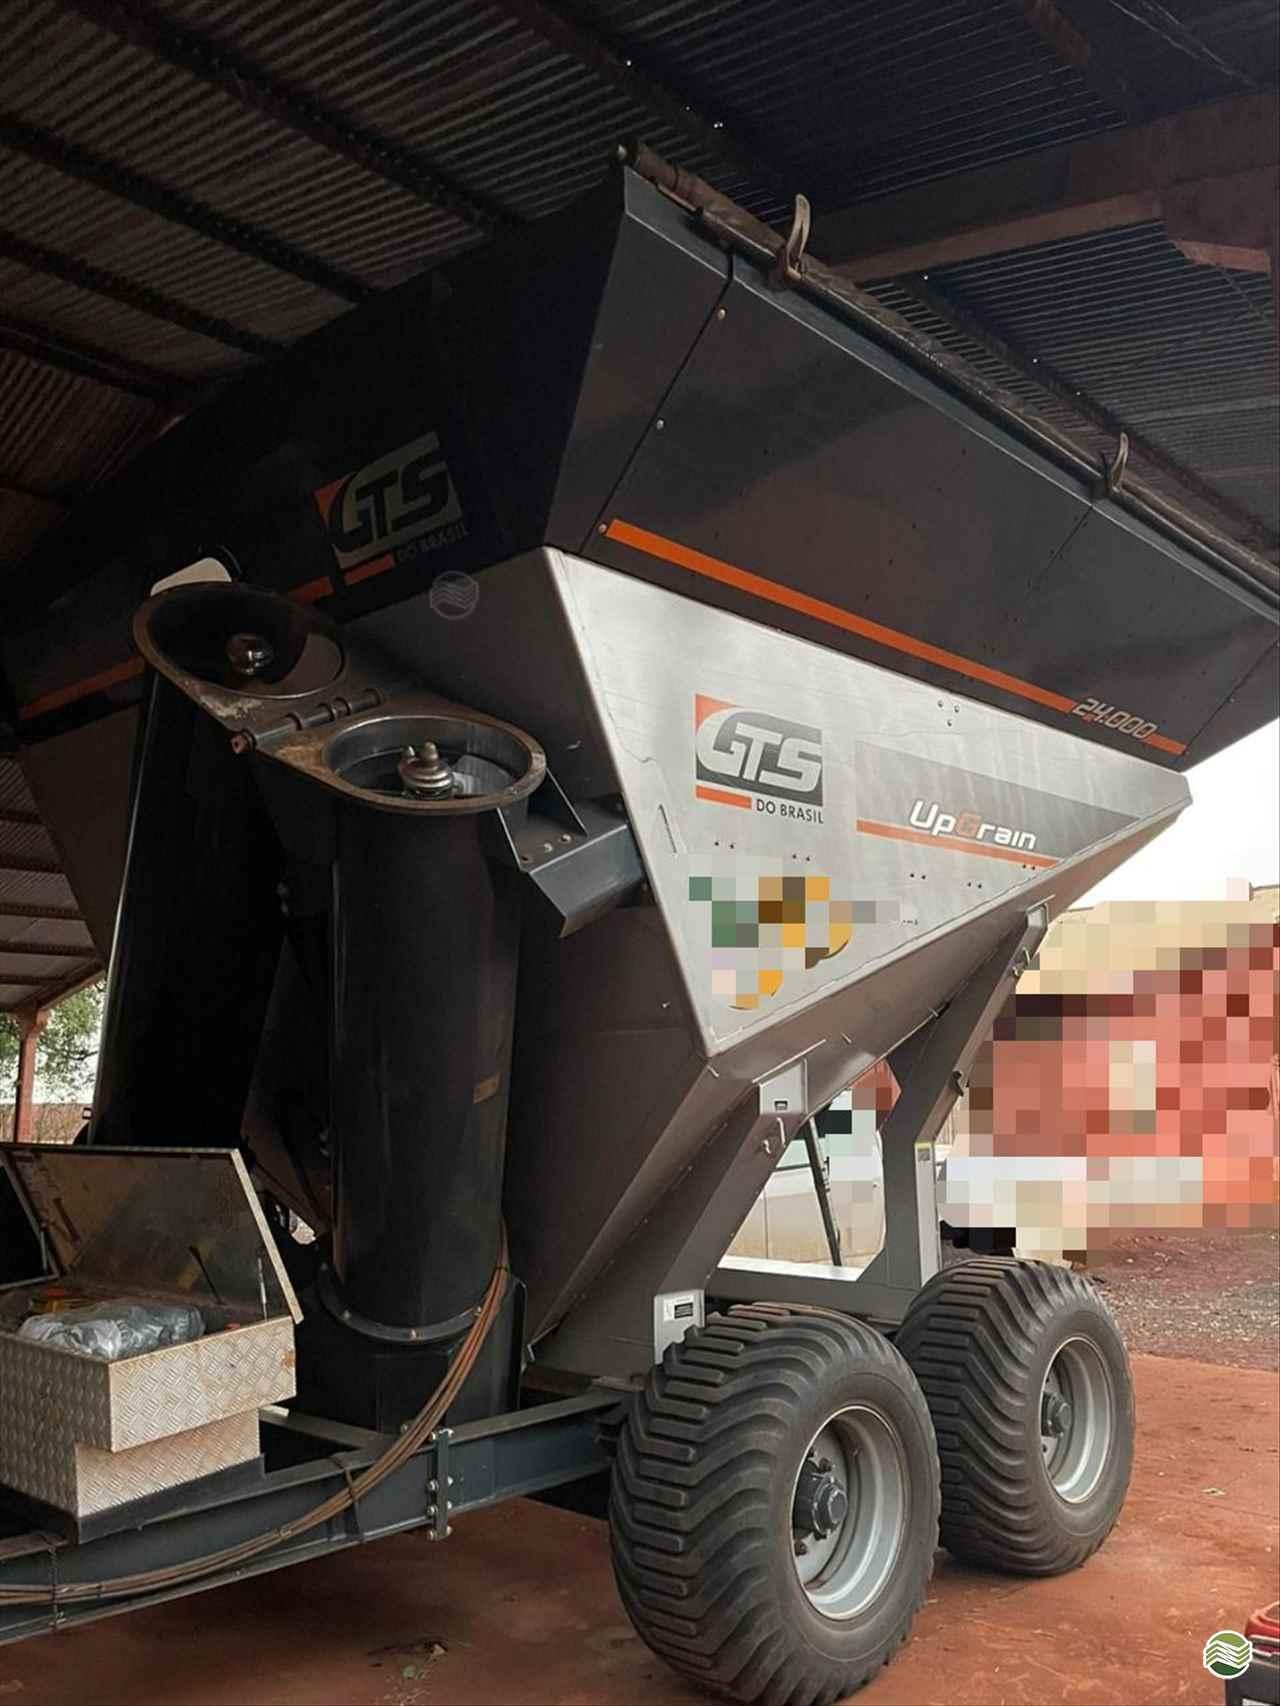 IMPLEMENTOS AGRICOLAS CARRETA BAZUKA GRANELEIRA 24000 Rural Vendas TERRA ROXA PARANÁ PR